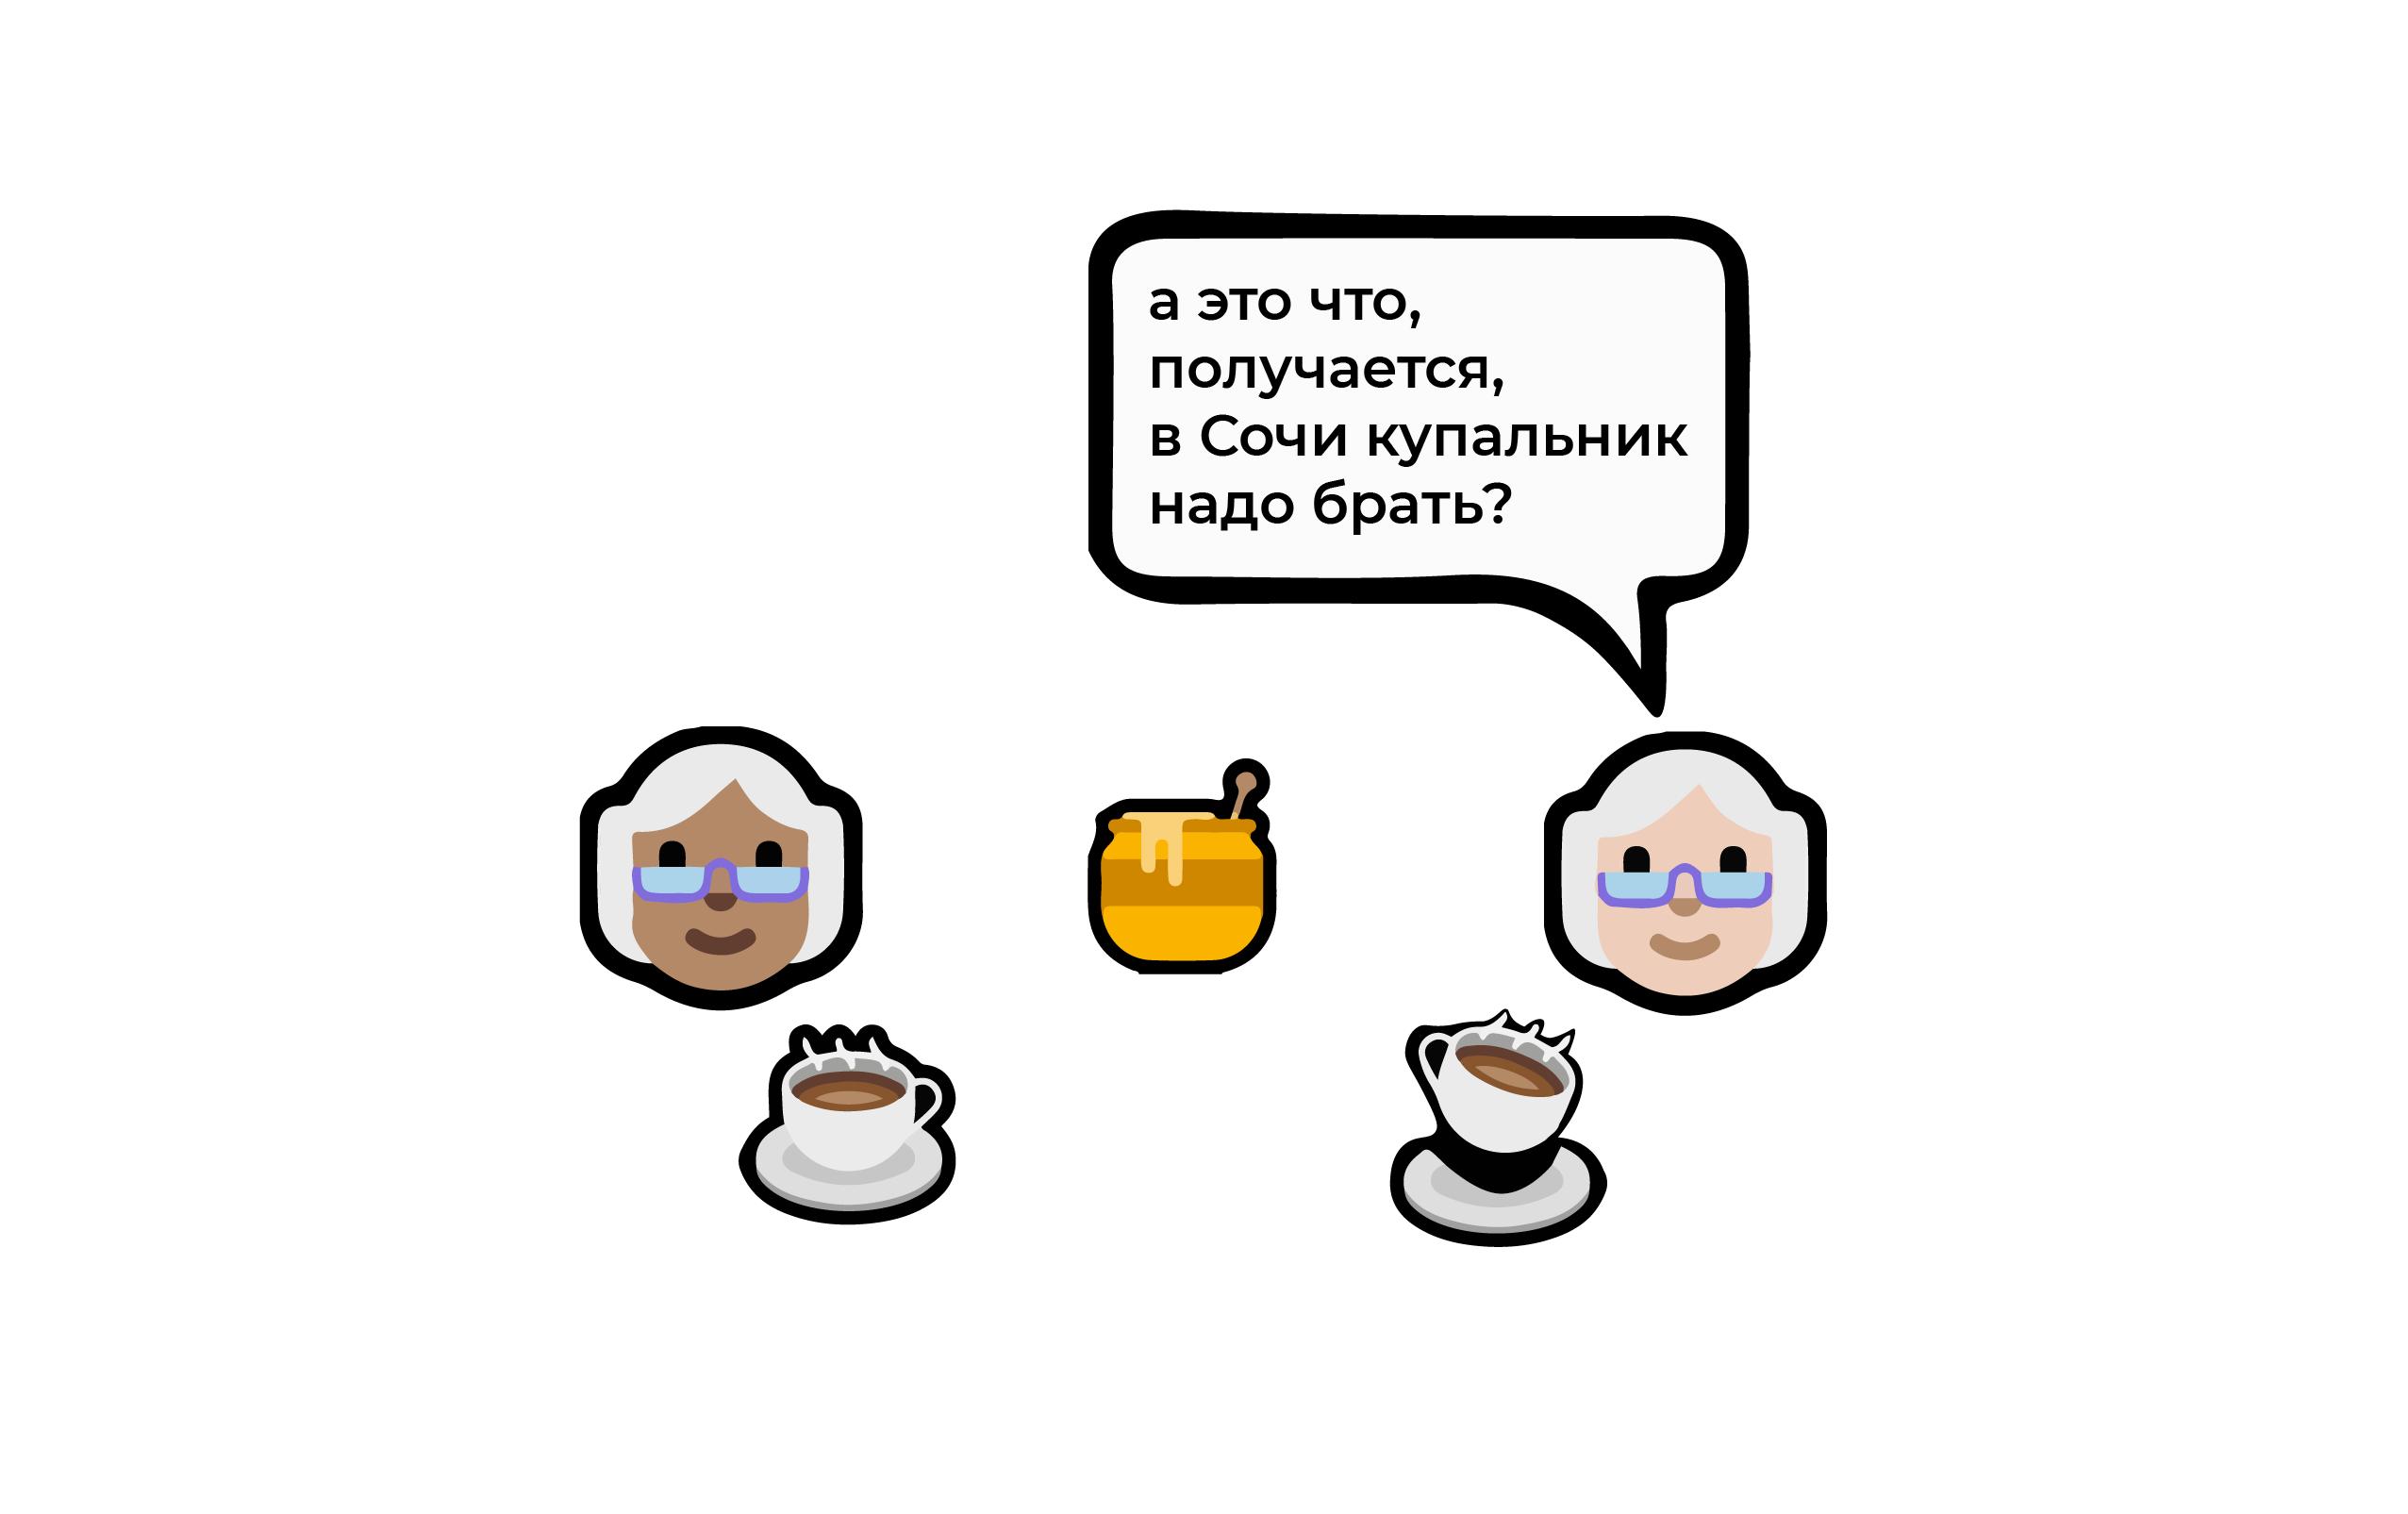 Иллюстрация диалога бабушек из Малого Турыша